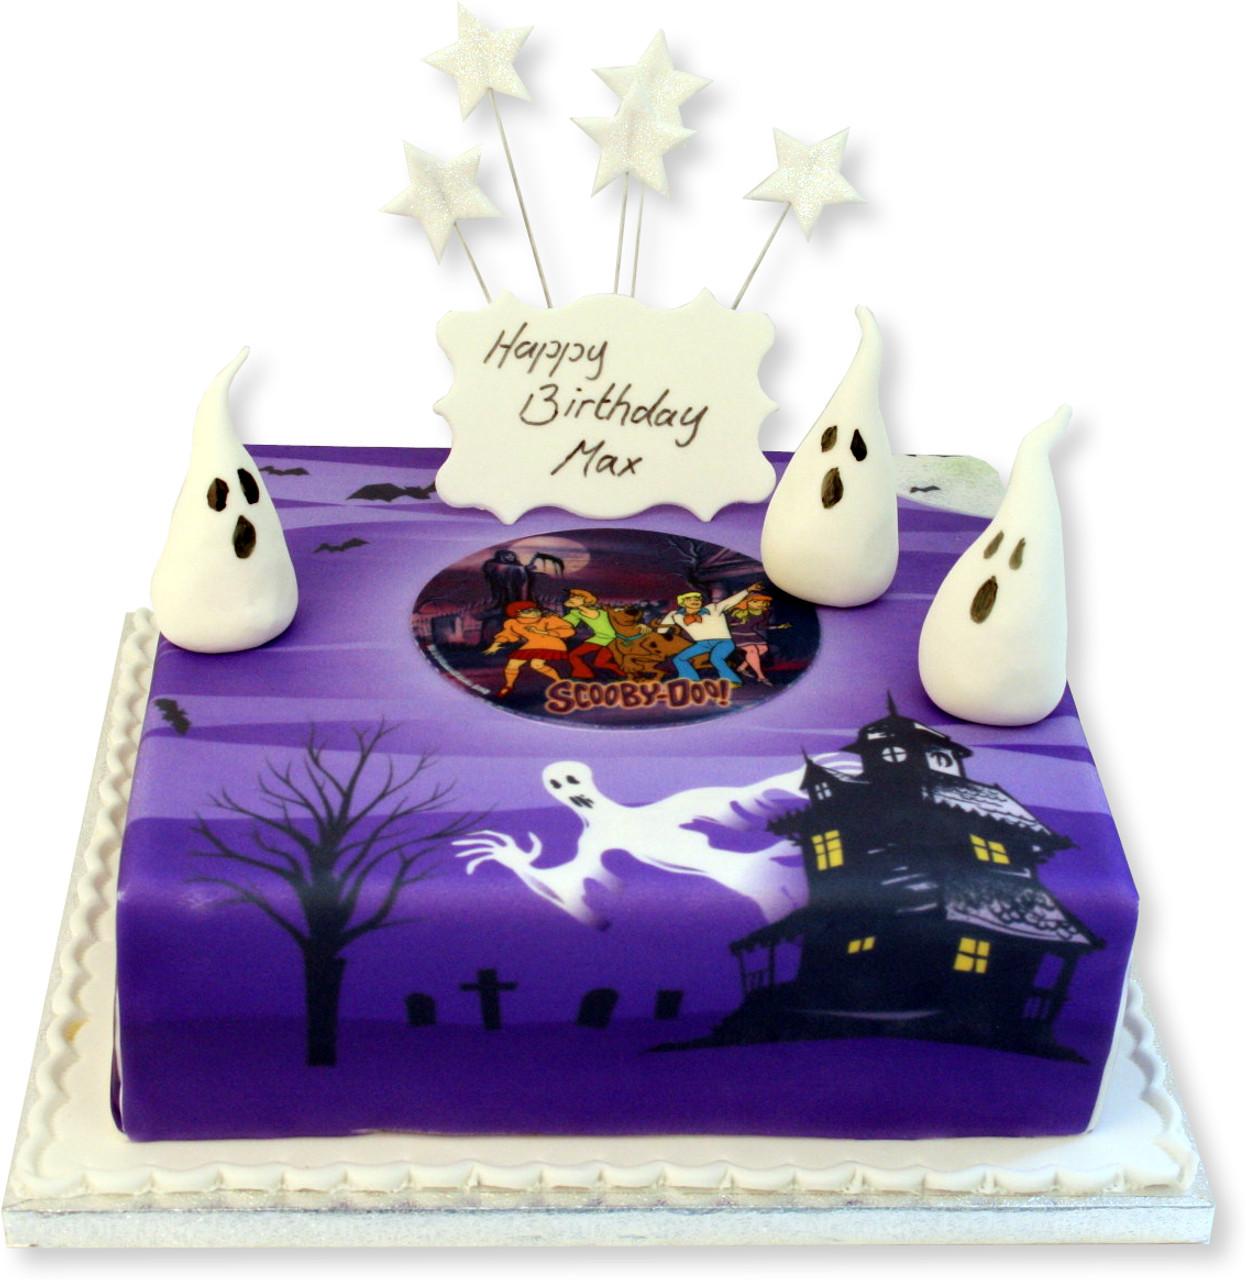 Excellent Scooby Doo Birthday Cake Boys Birthday Cakes The Brilliant Bakers Funny Birthday Cards Online Alyptdamsfinfo